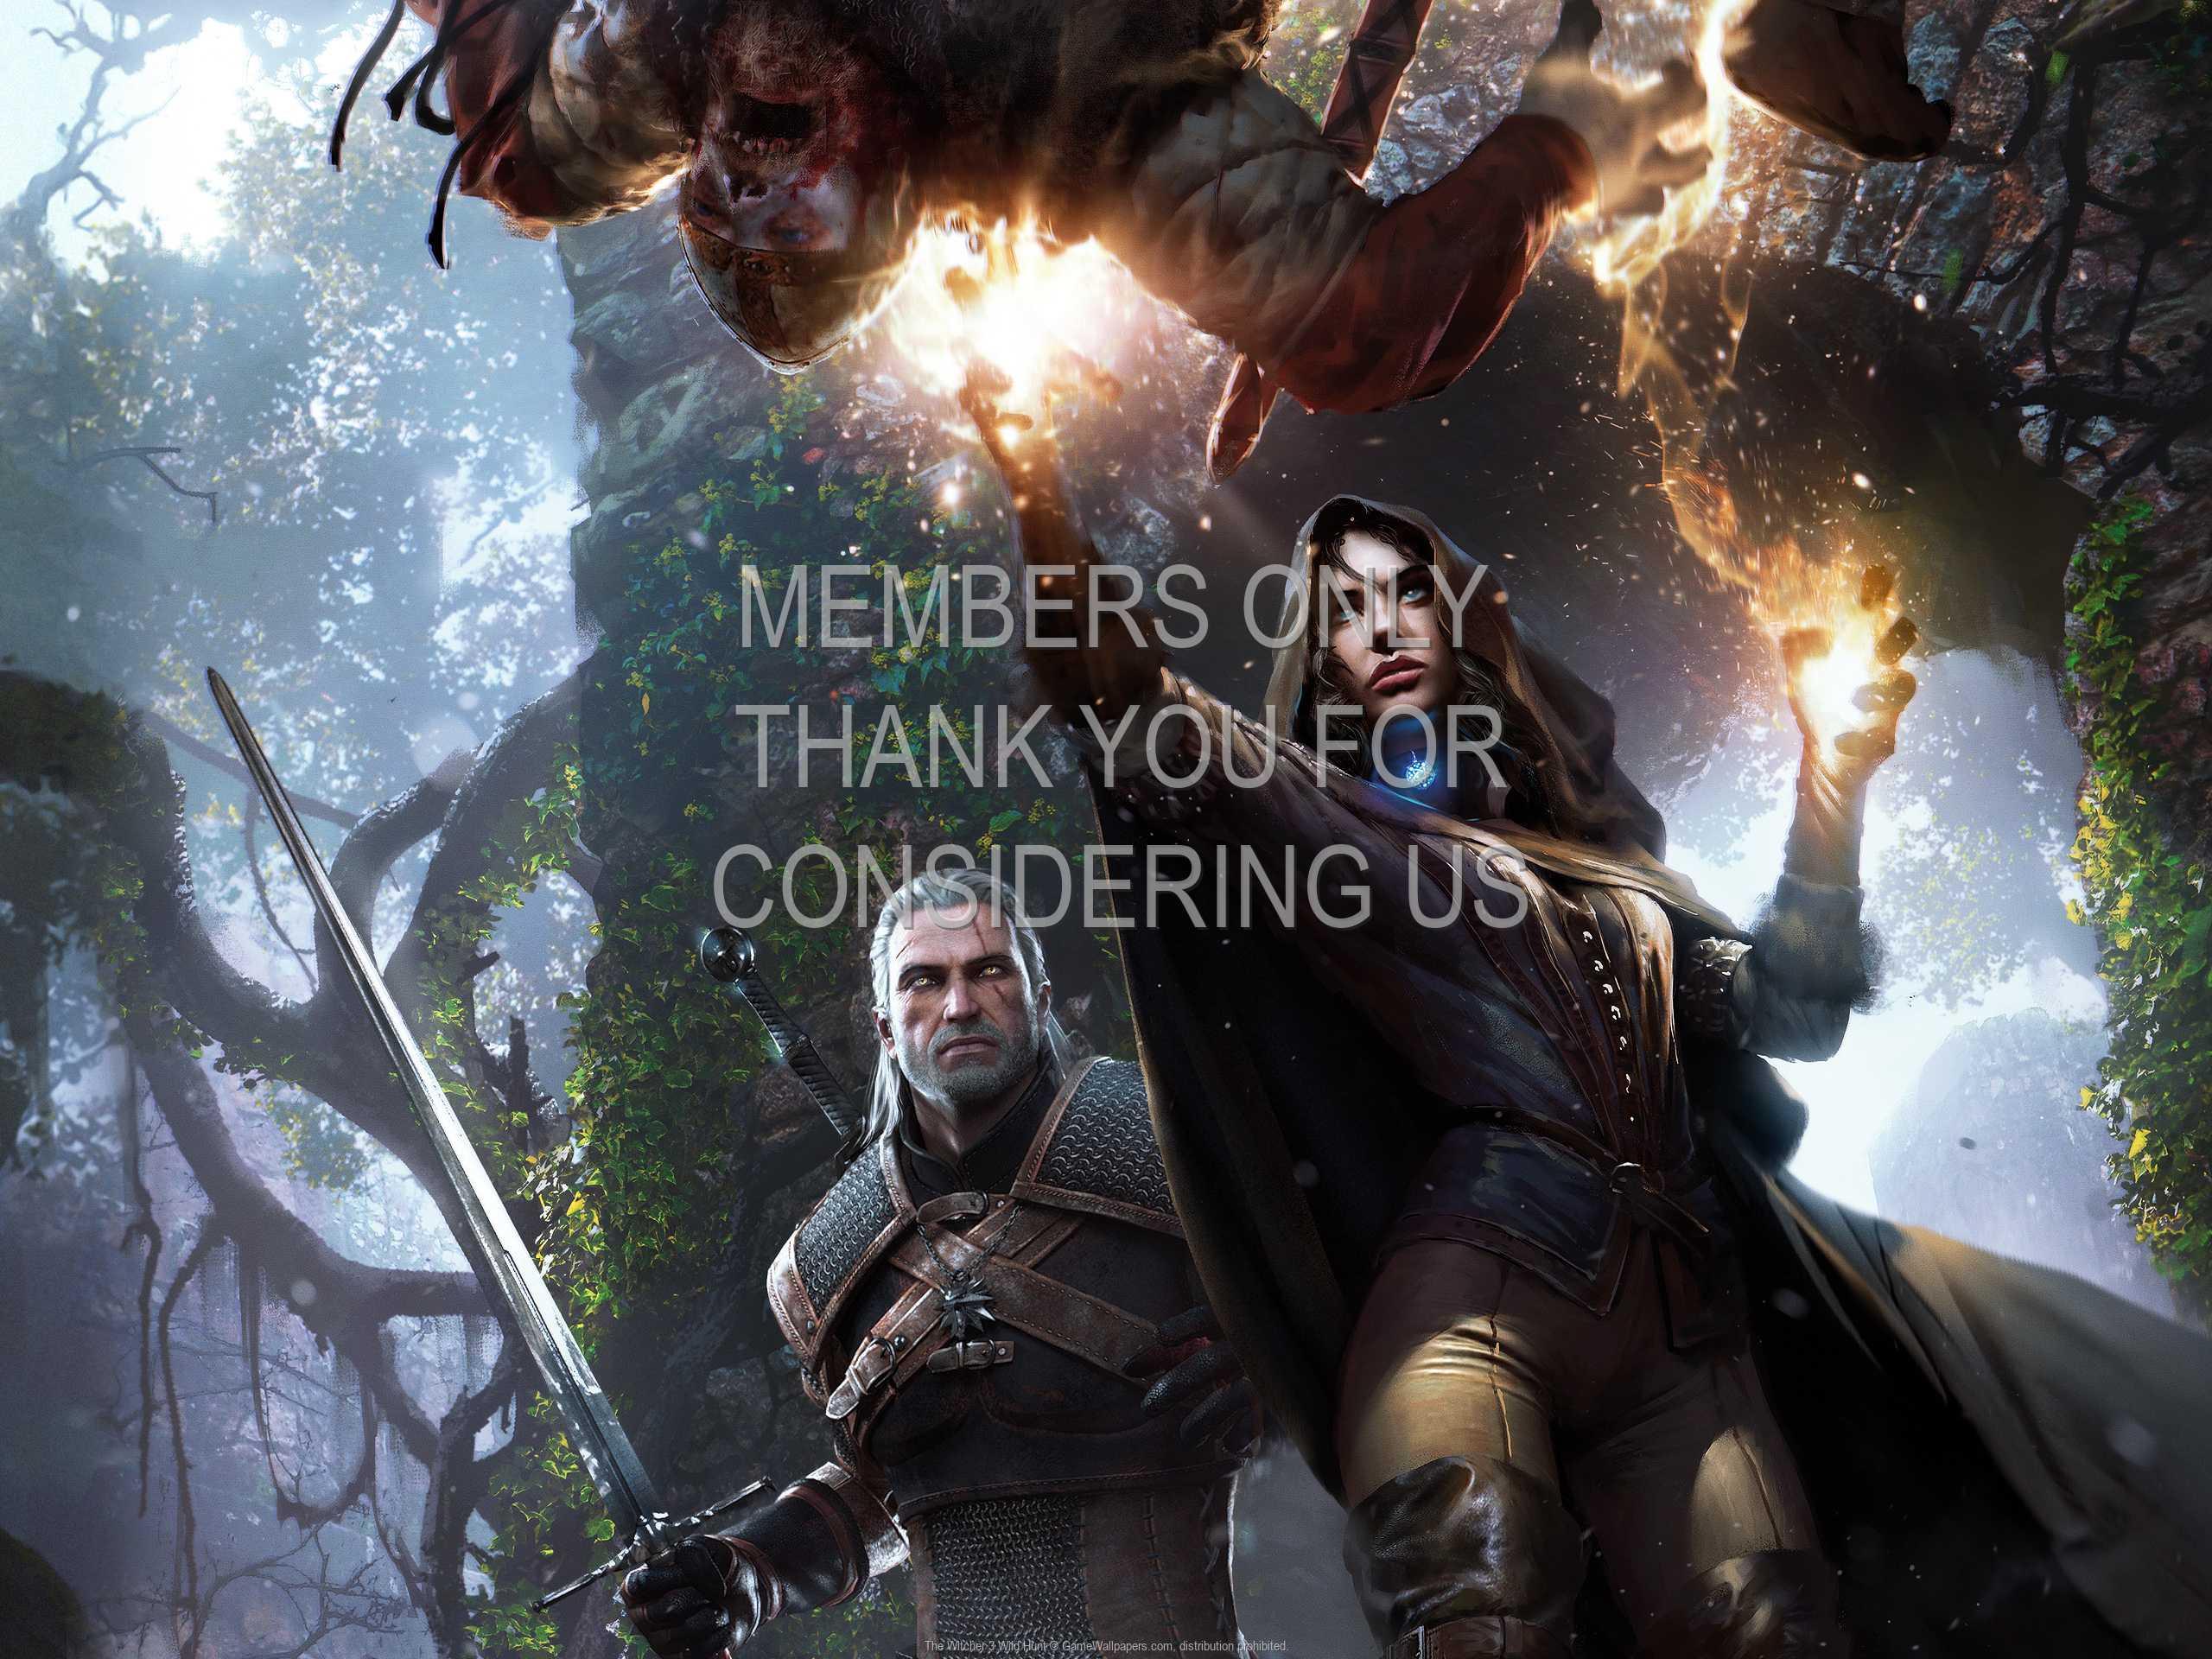 The Witcher 3: Wild Hunt 1080p Horizontal Handy Hintergrundbild 18